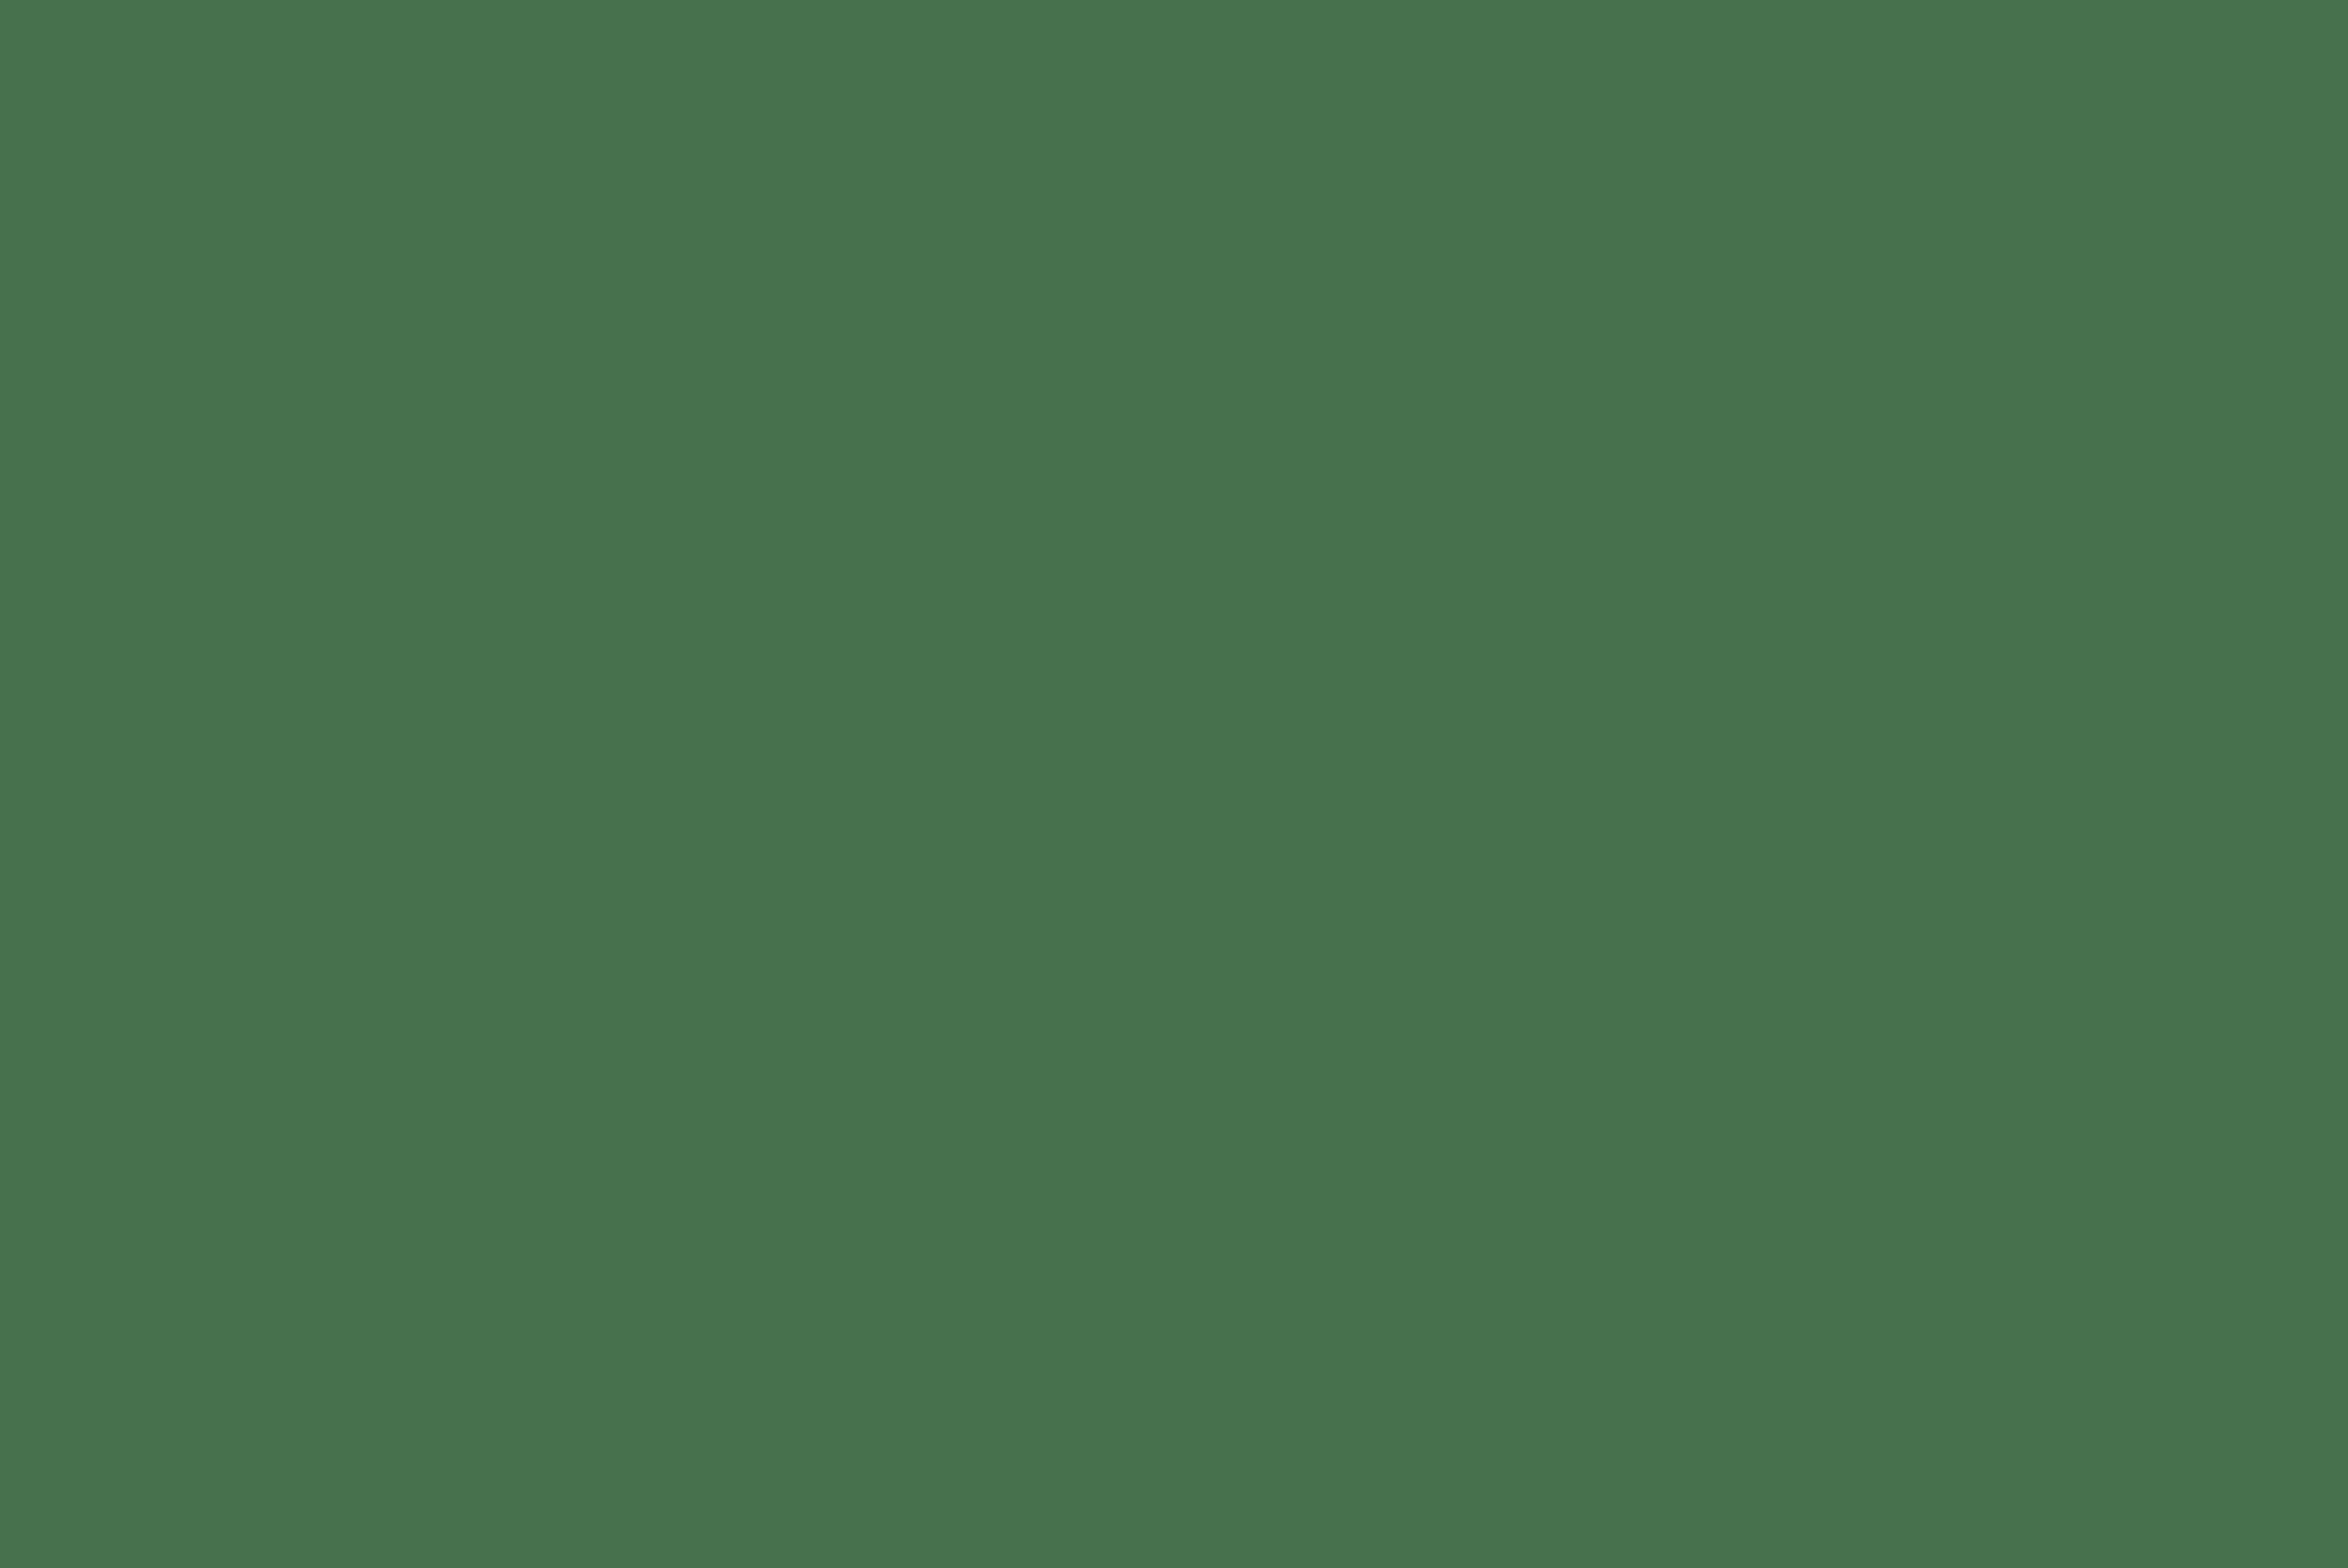 GRAIN SCONCE